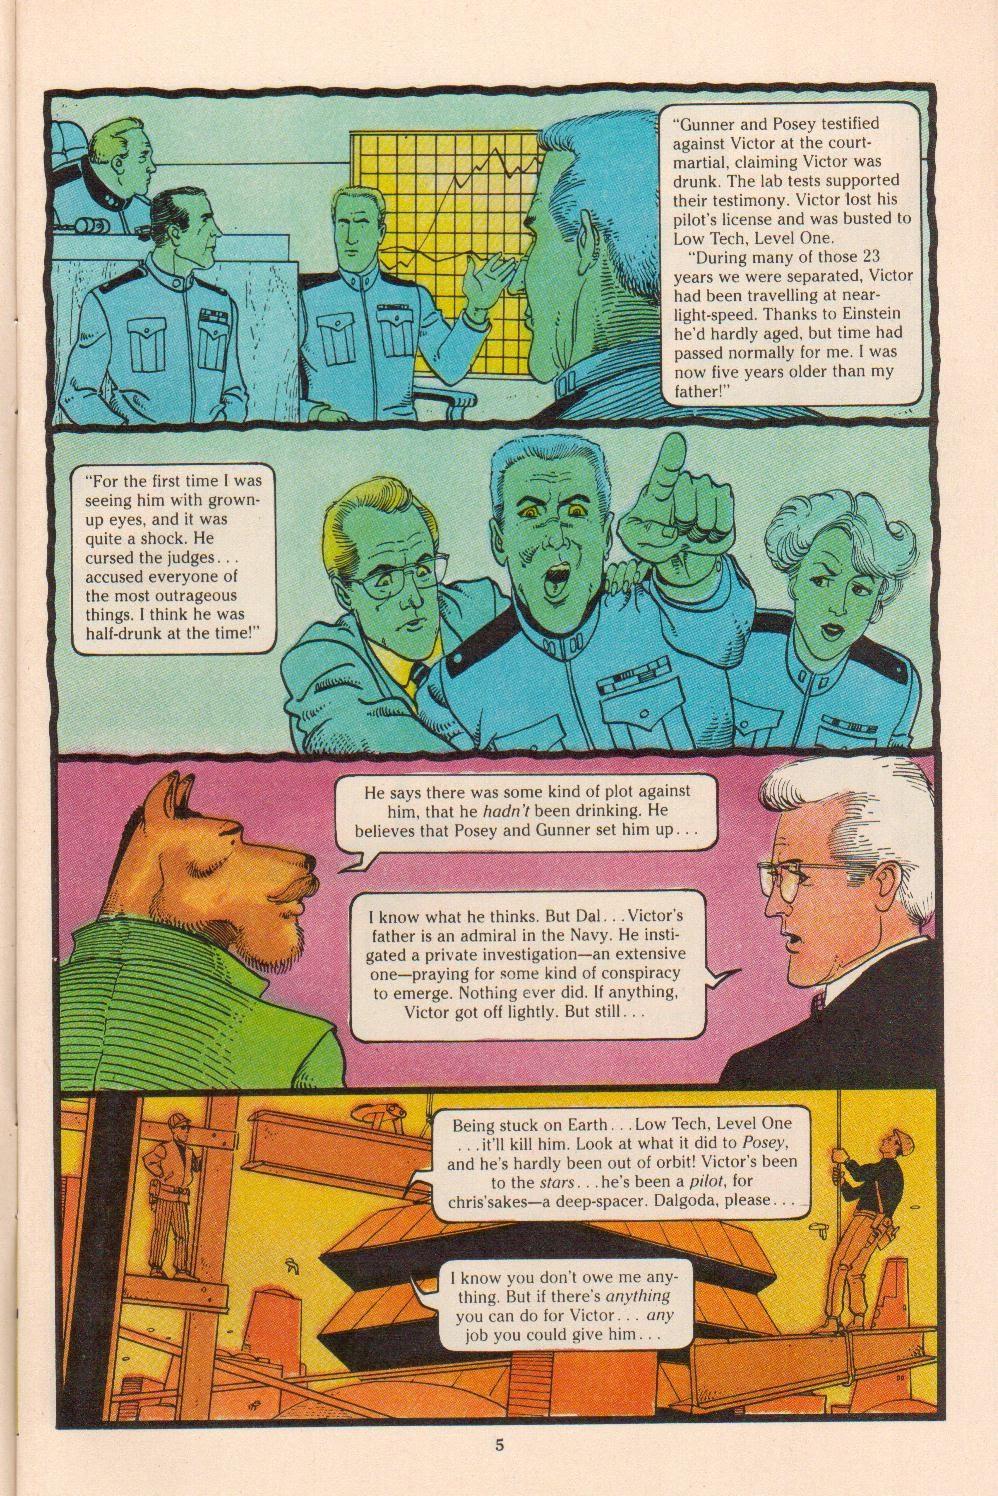 Read online Dalgoda comic -  Issue #5 - 7